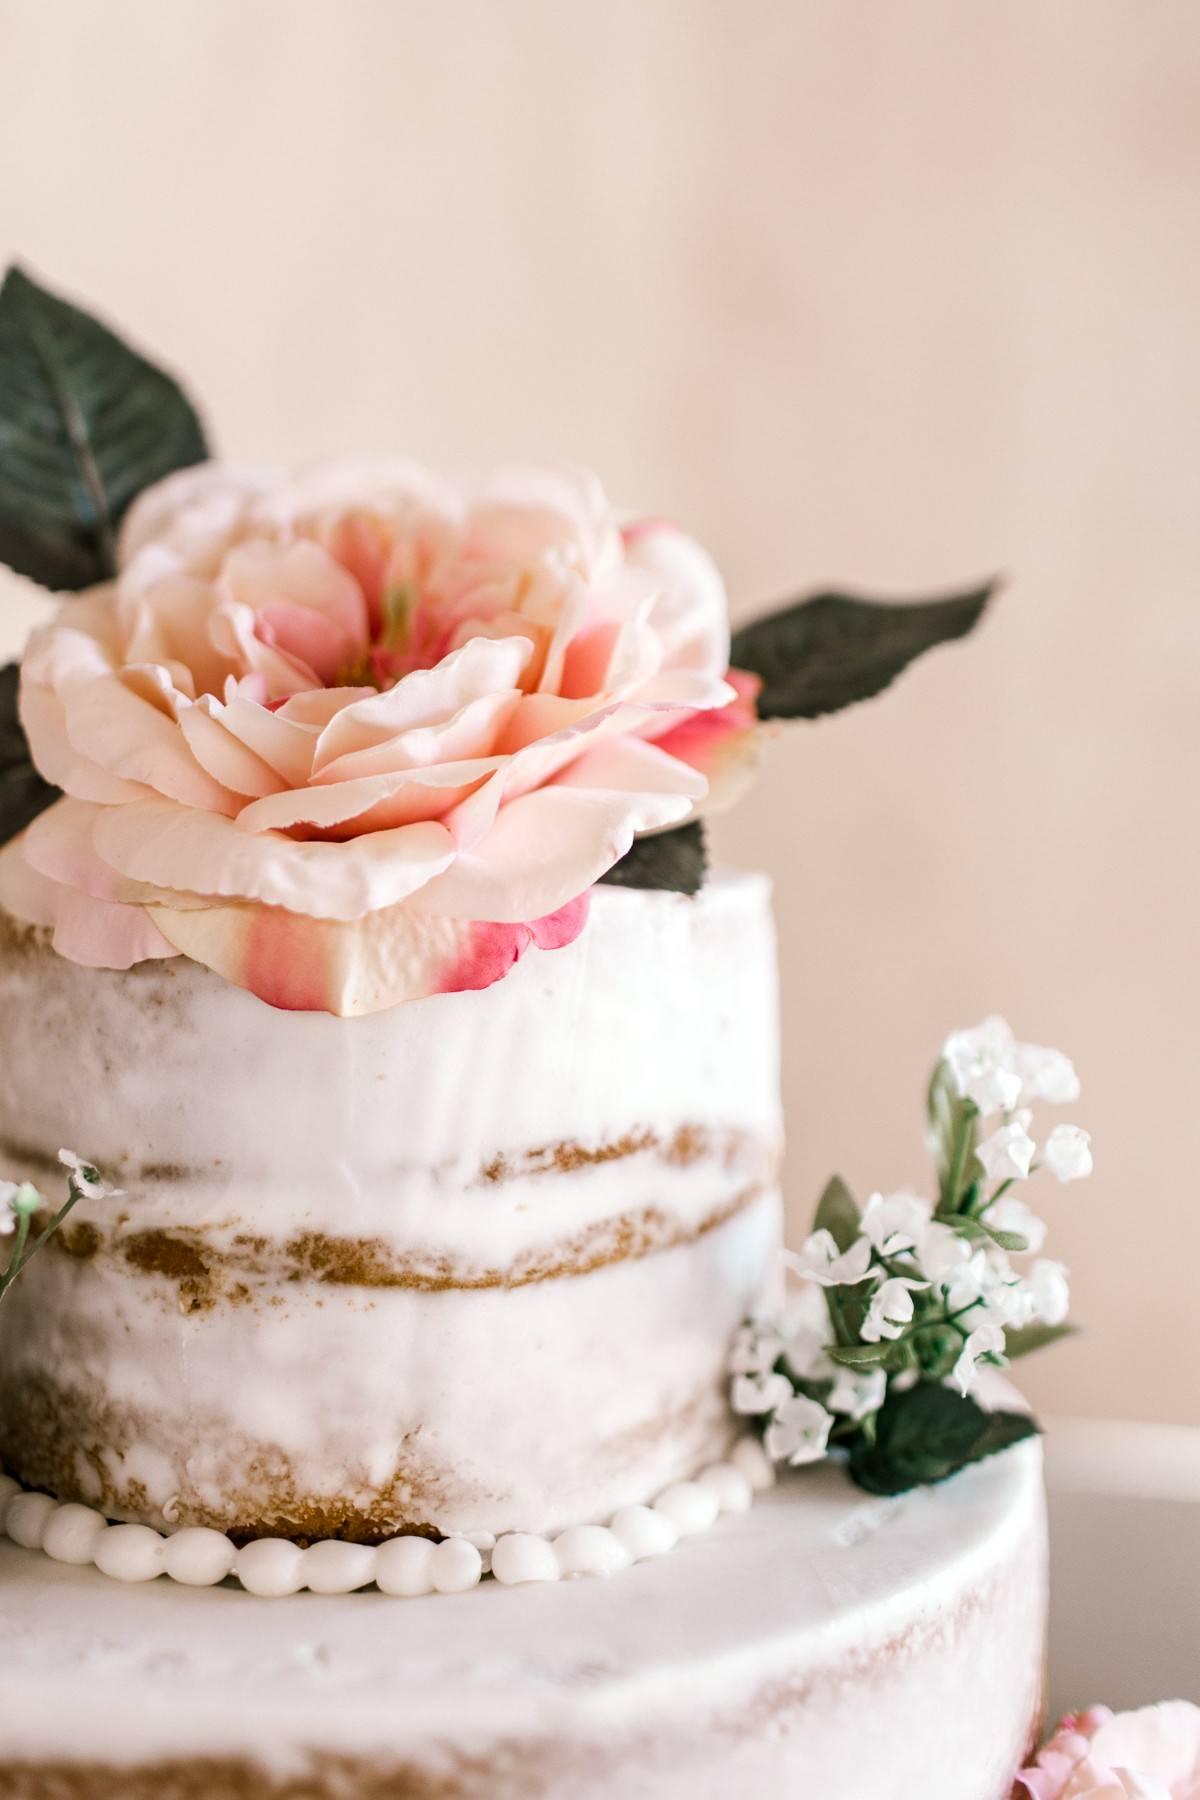 ennis-texas-wedding-photographer-kaitlyn-bullard-06.jpg